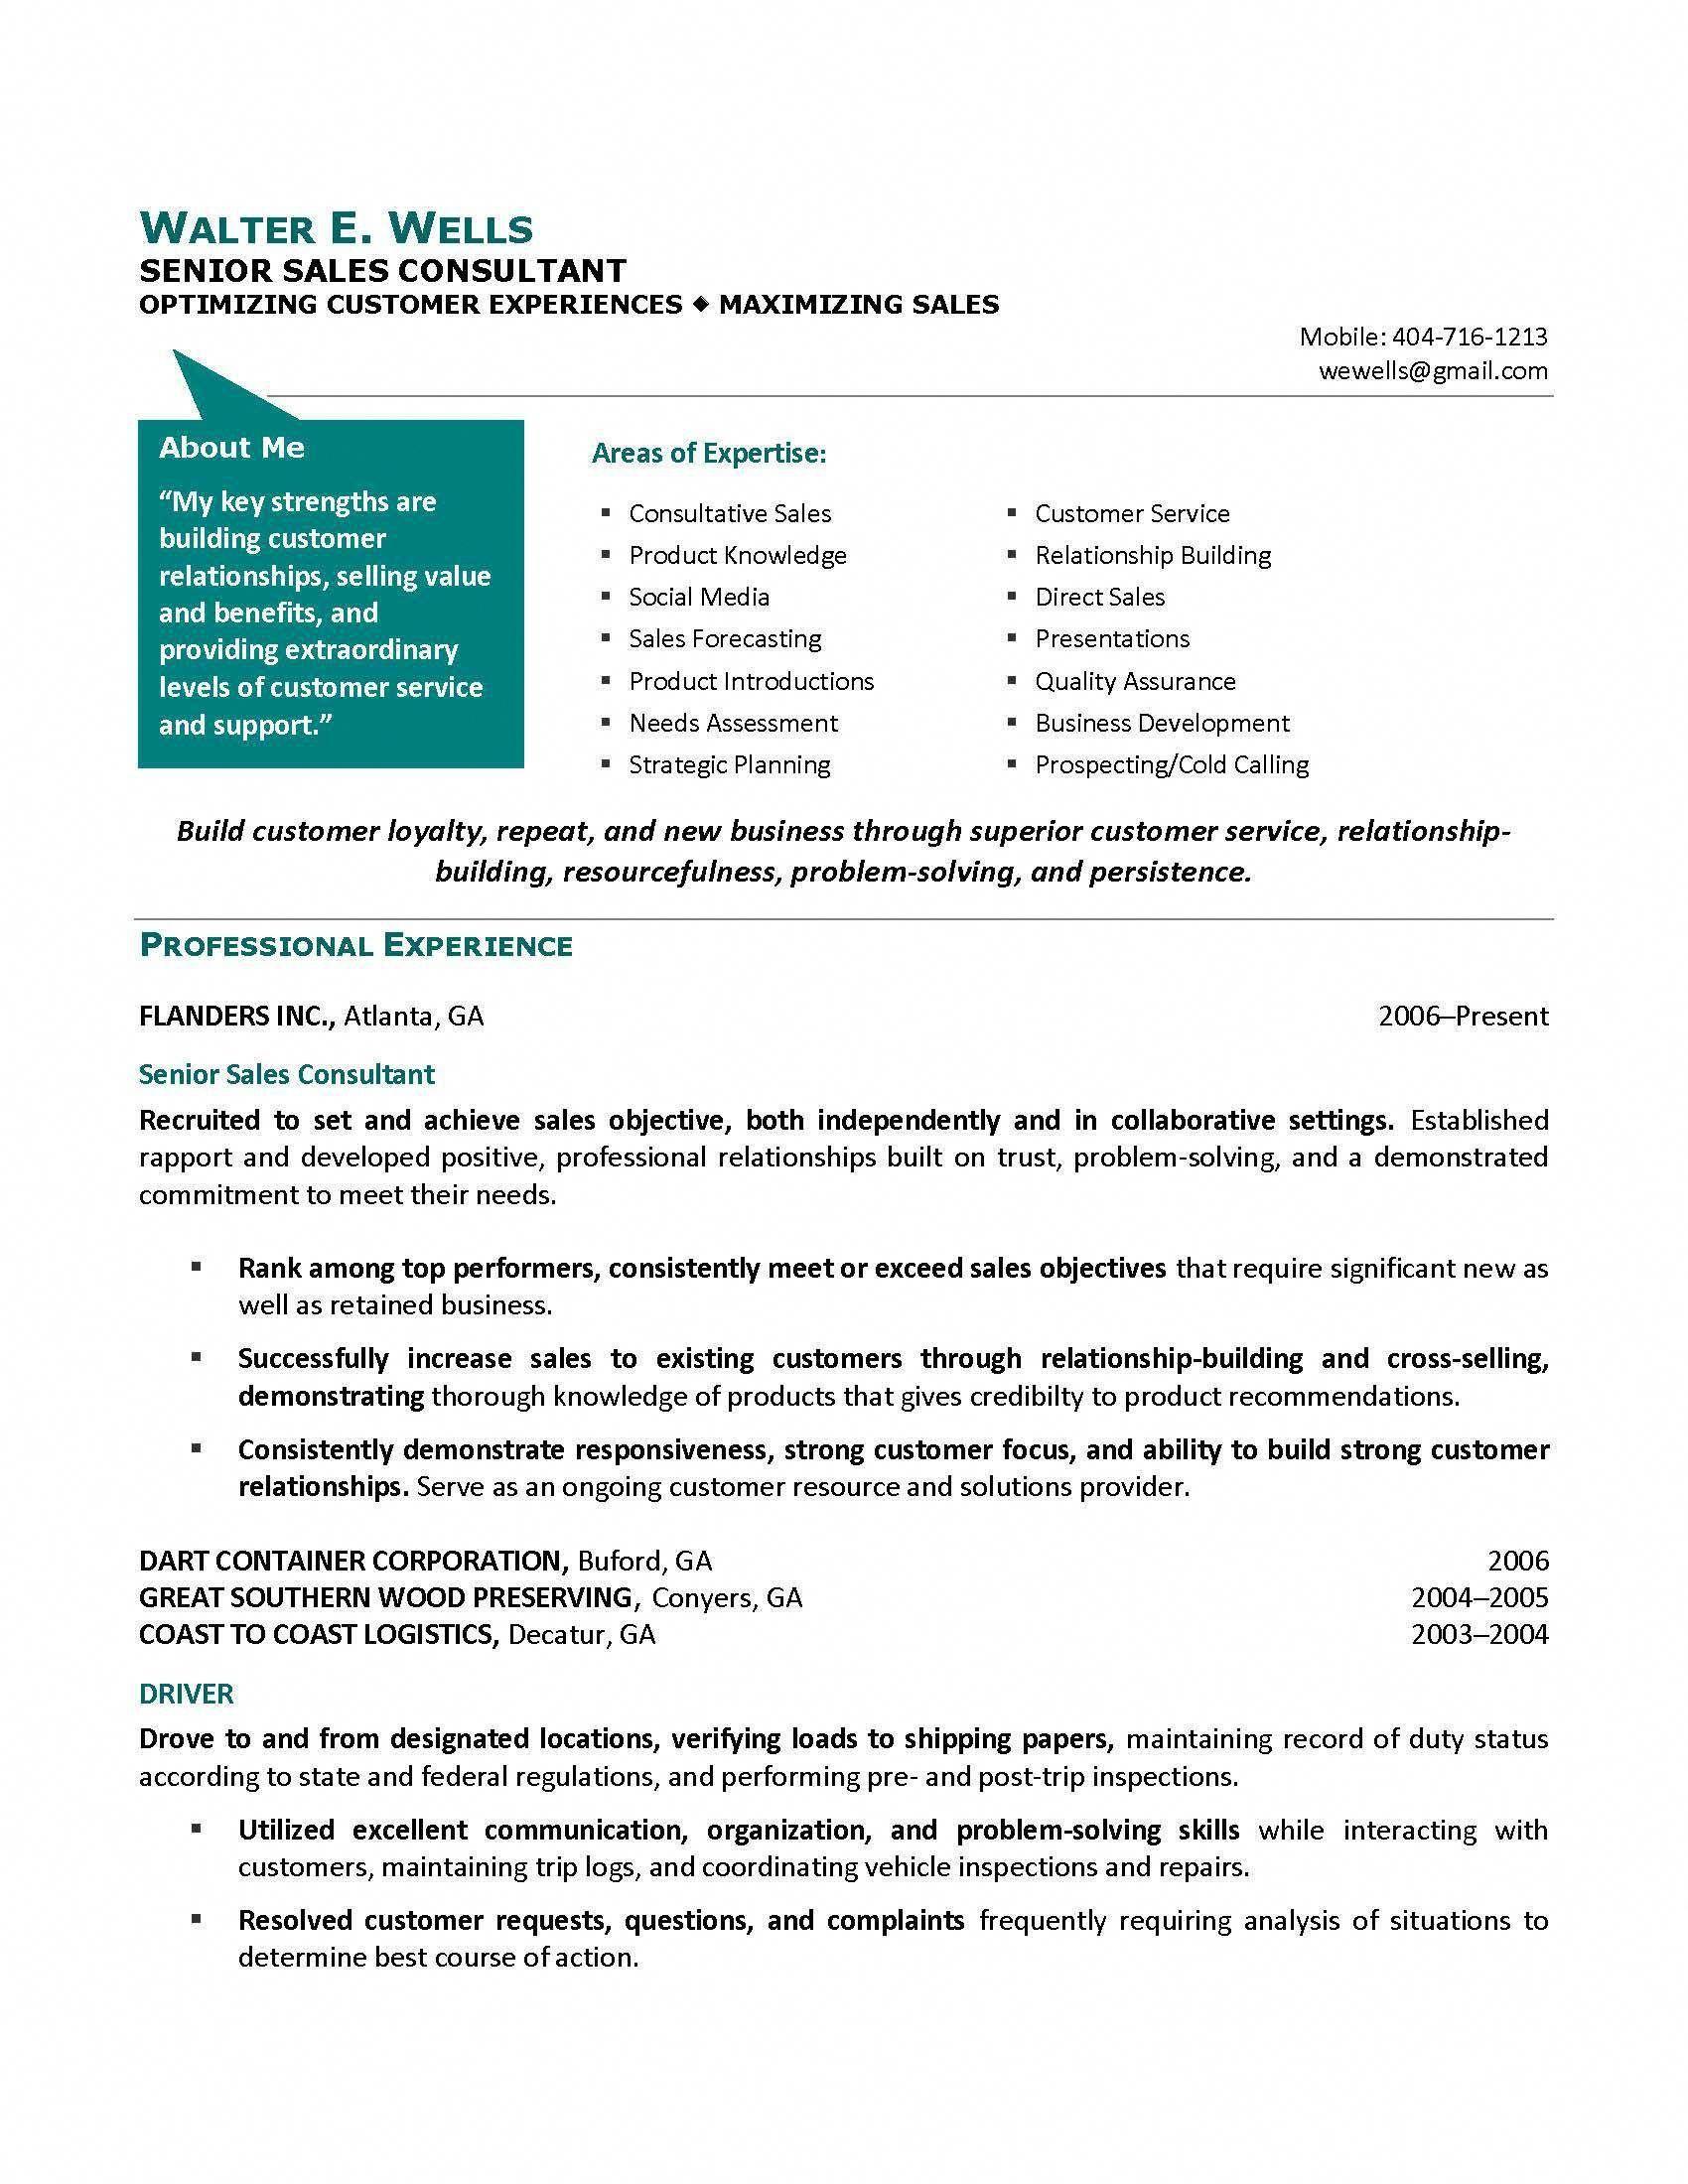 senior sales consultant resume sample, provided by Elite Resume ...